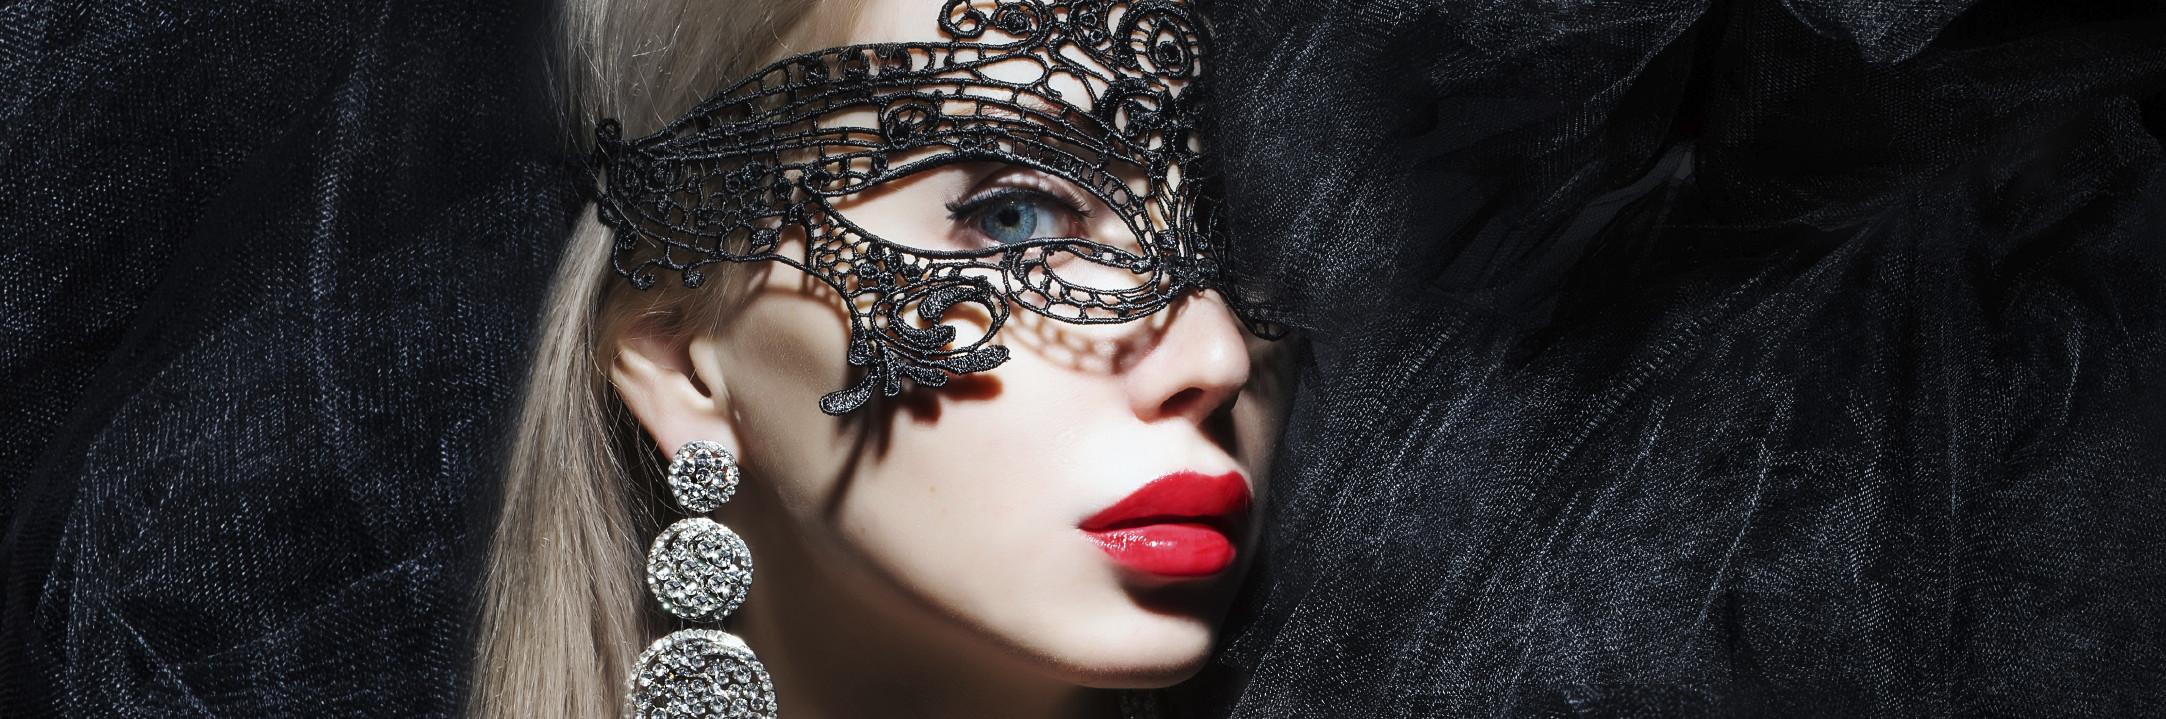 Makeup Artist Portfolio Photo Shoot Illusions Makeover Studio